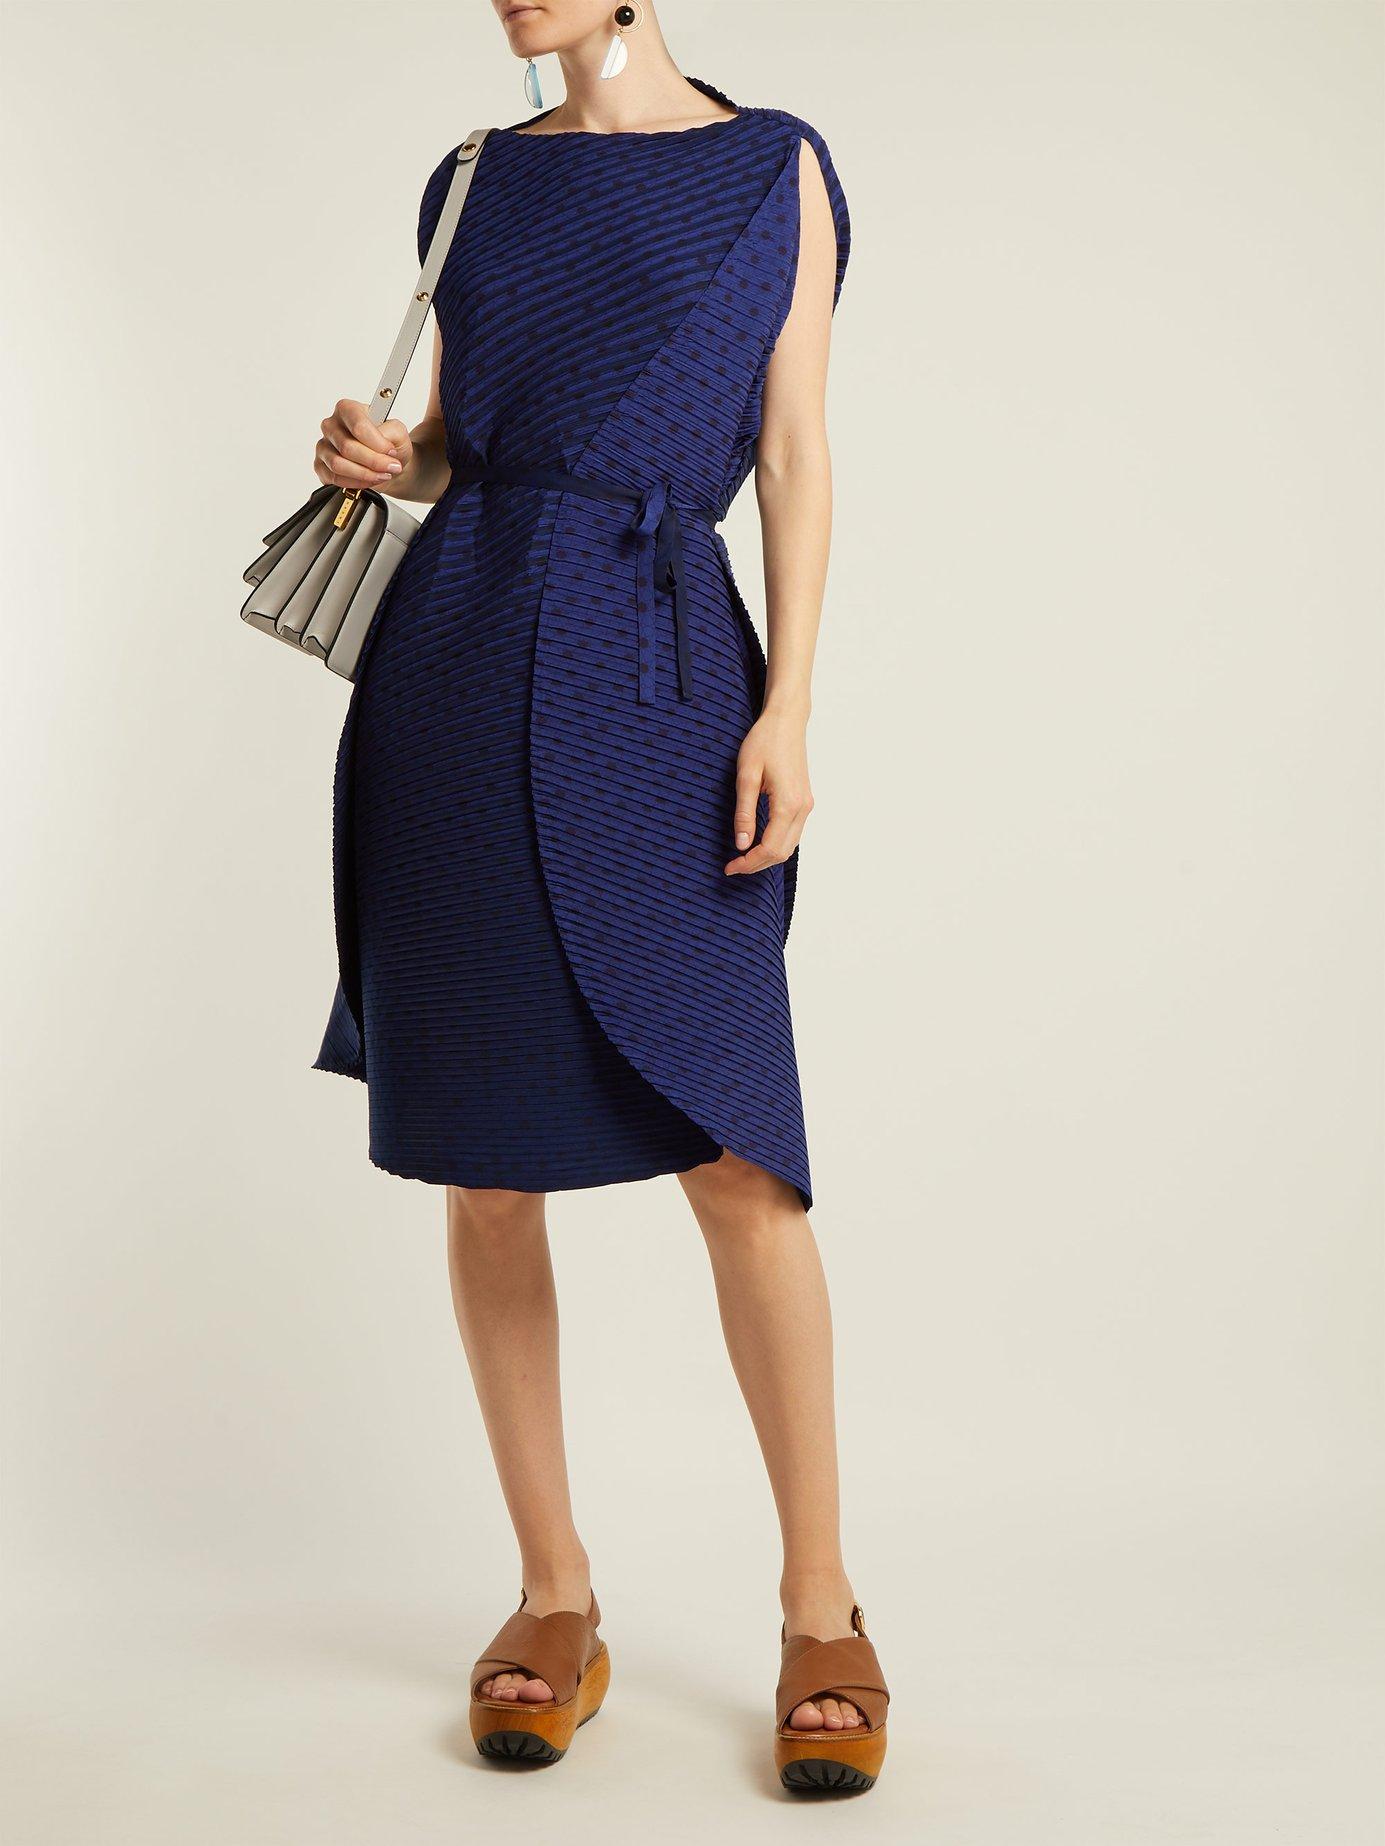 Sunlight pleated midi dress by Issey Miyake